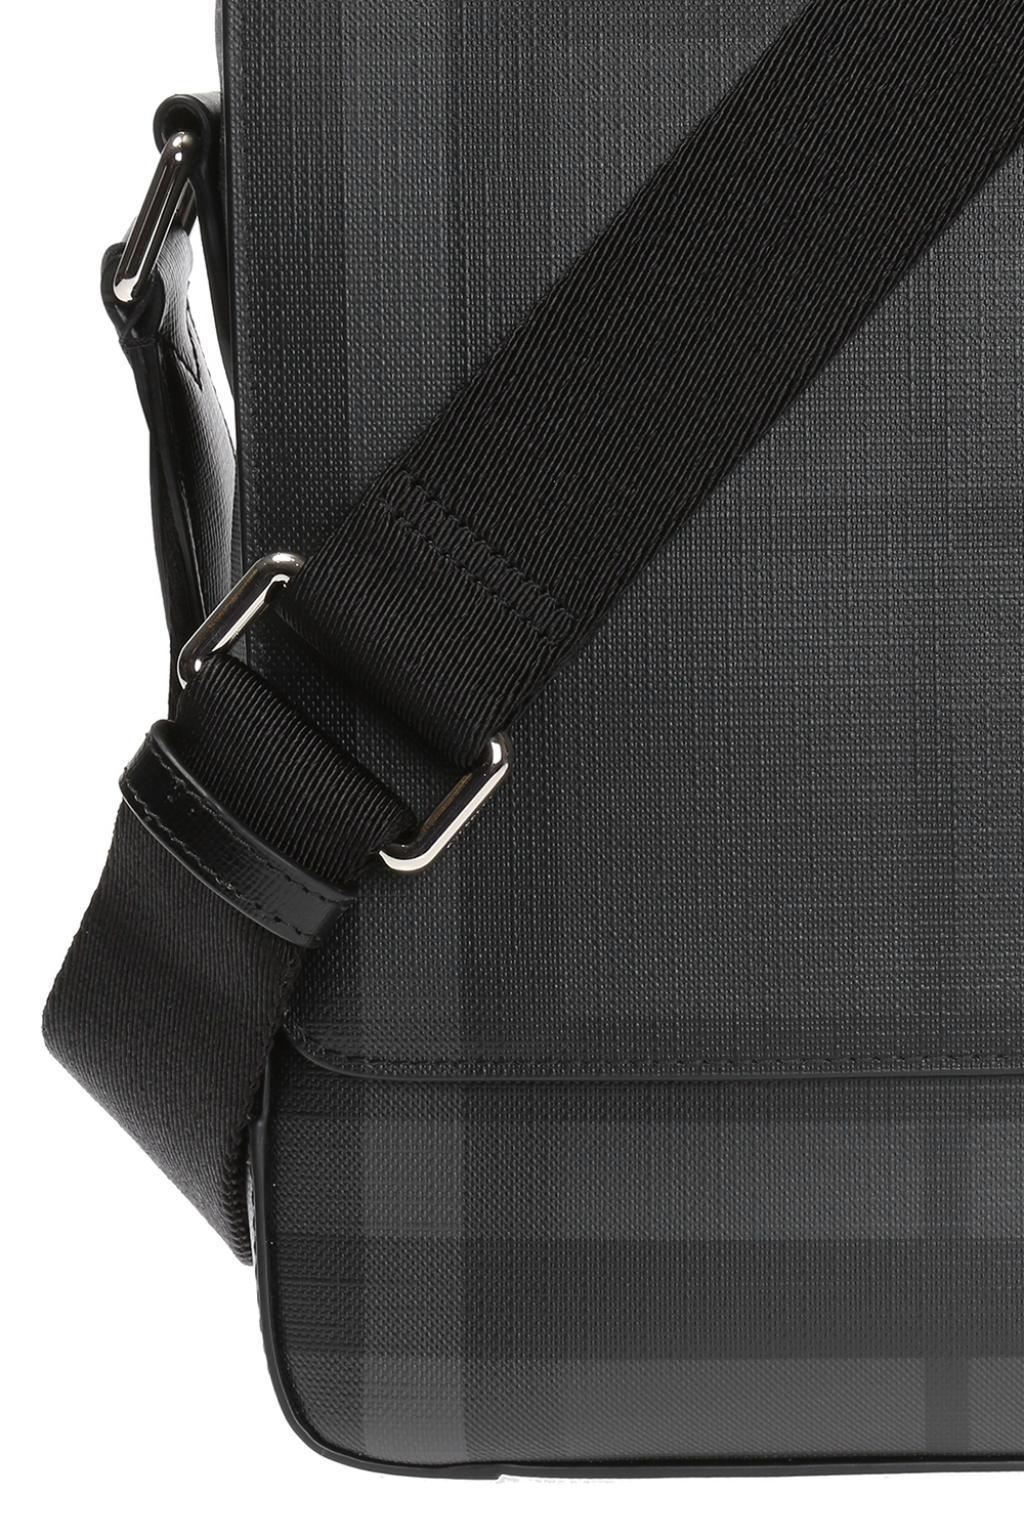 a2ff0de90c78 Lyst - Burberry  london Check  Patterned Shoulder Bag in Black for ...